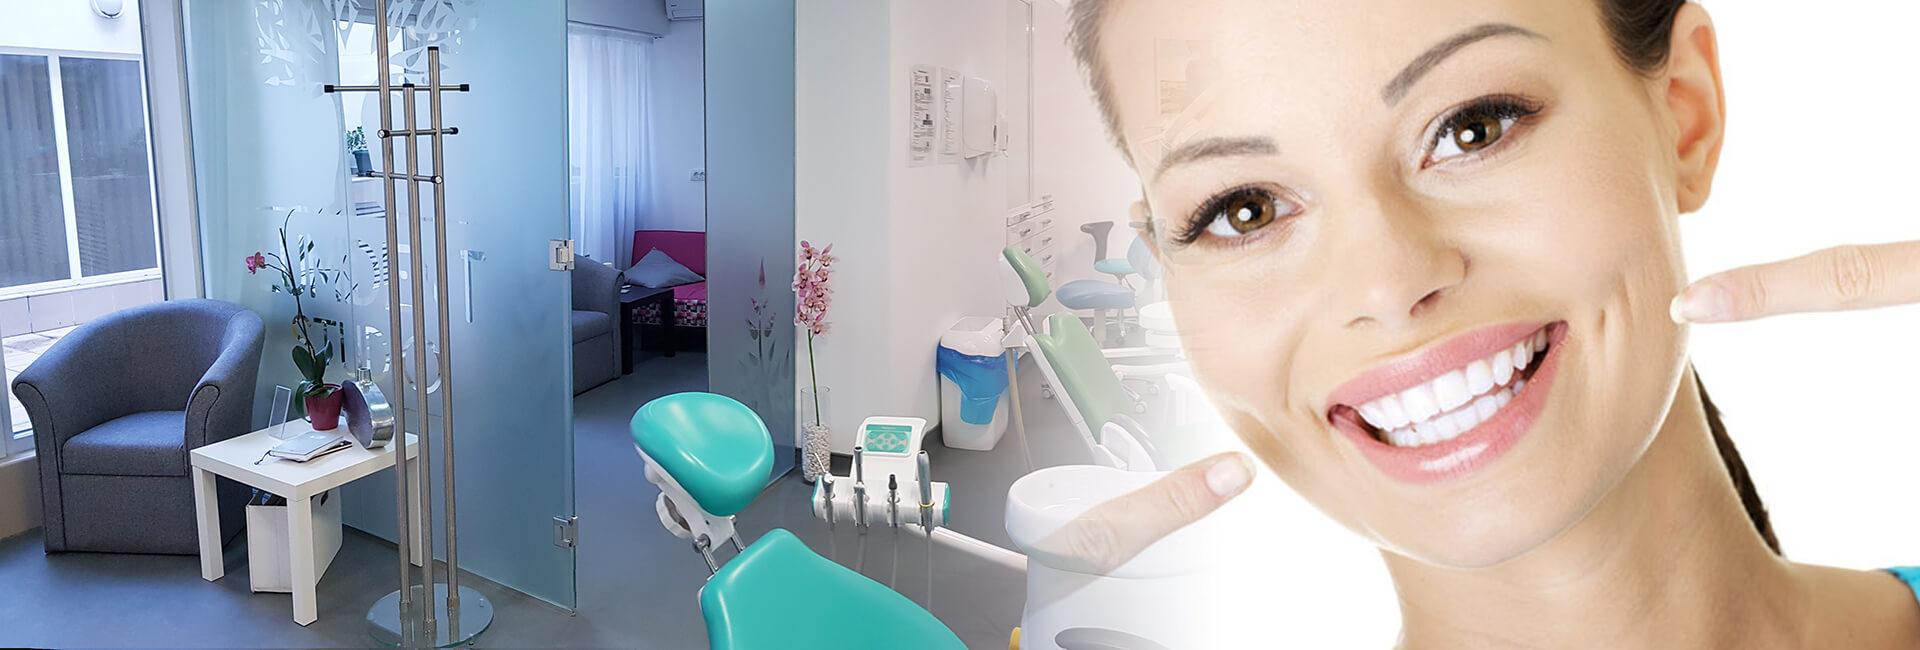 stomatološka ordinacija lumident vracar beograd